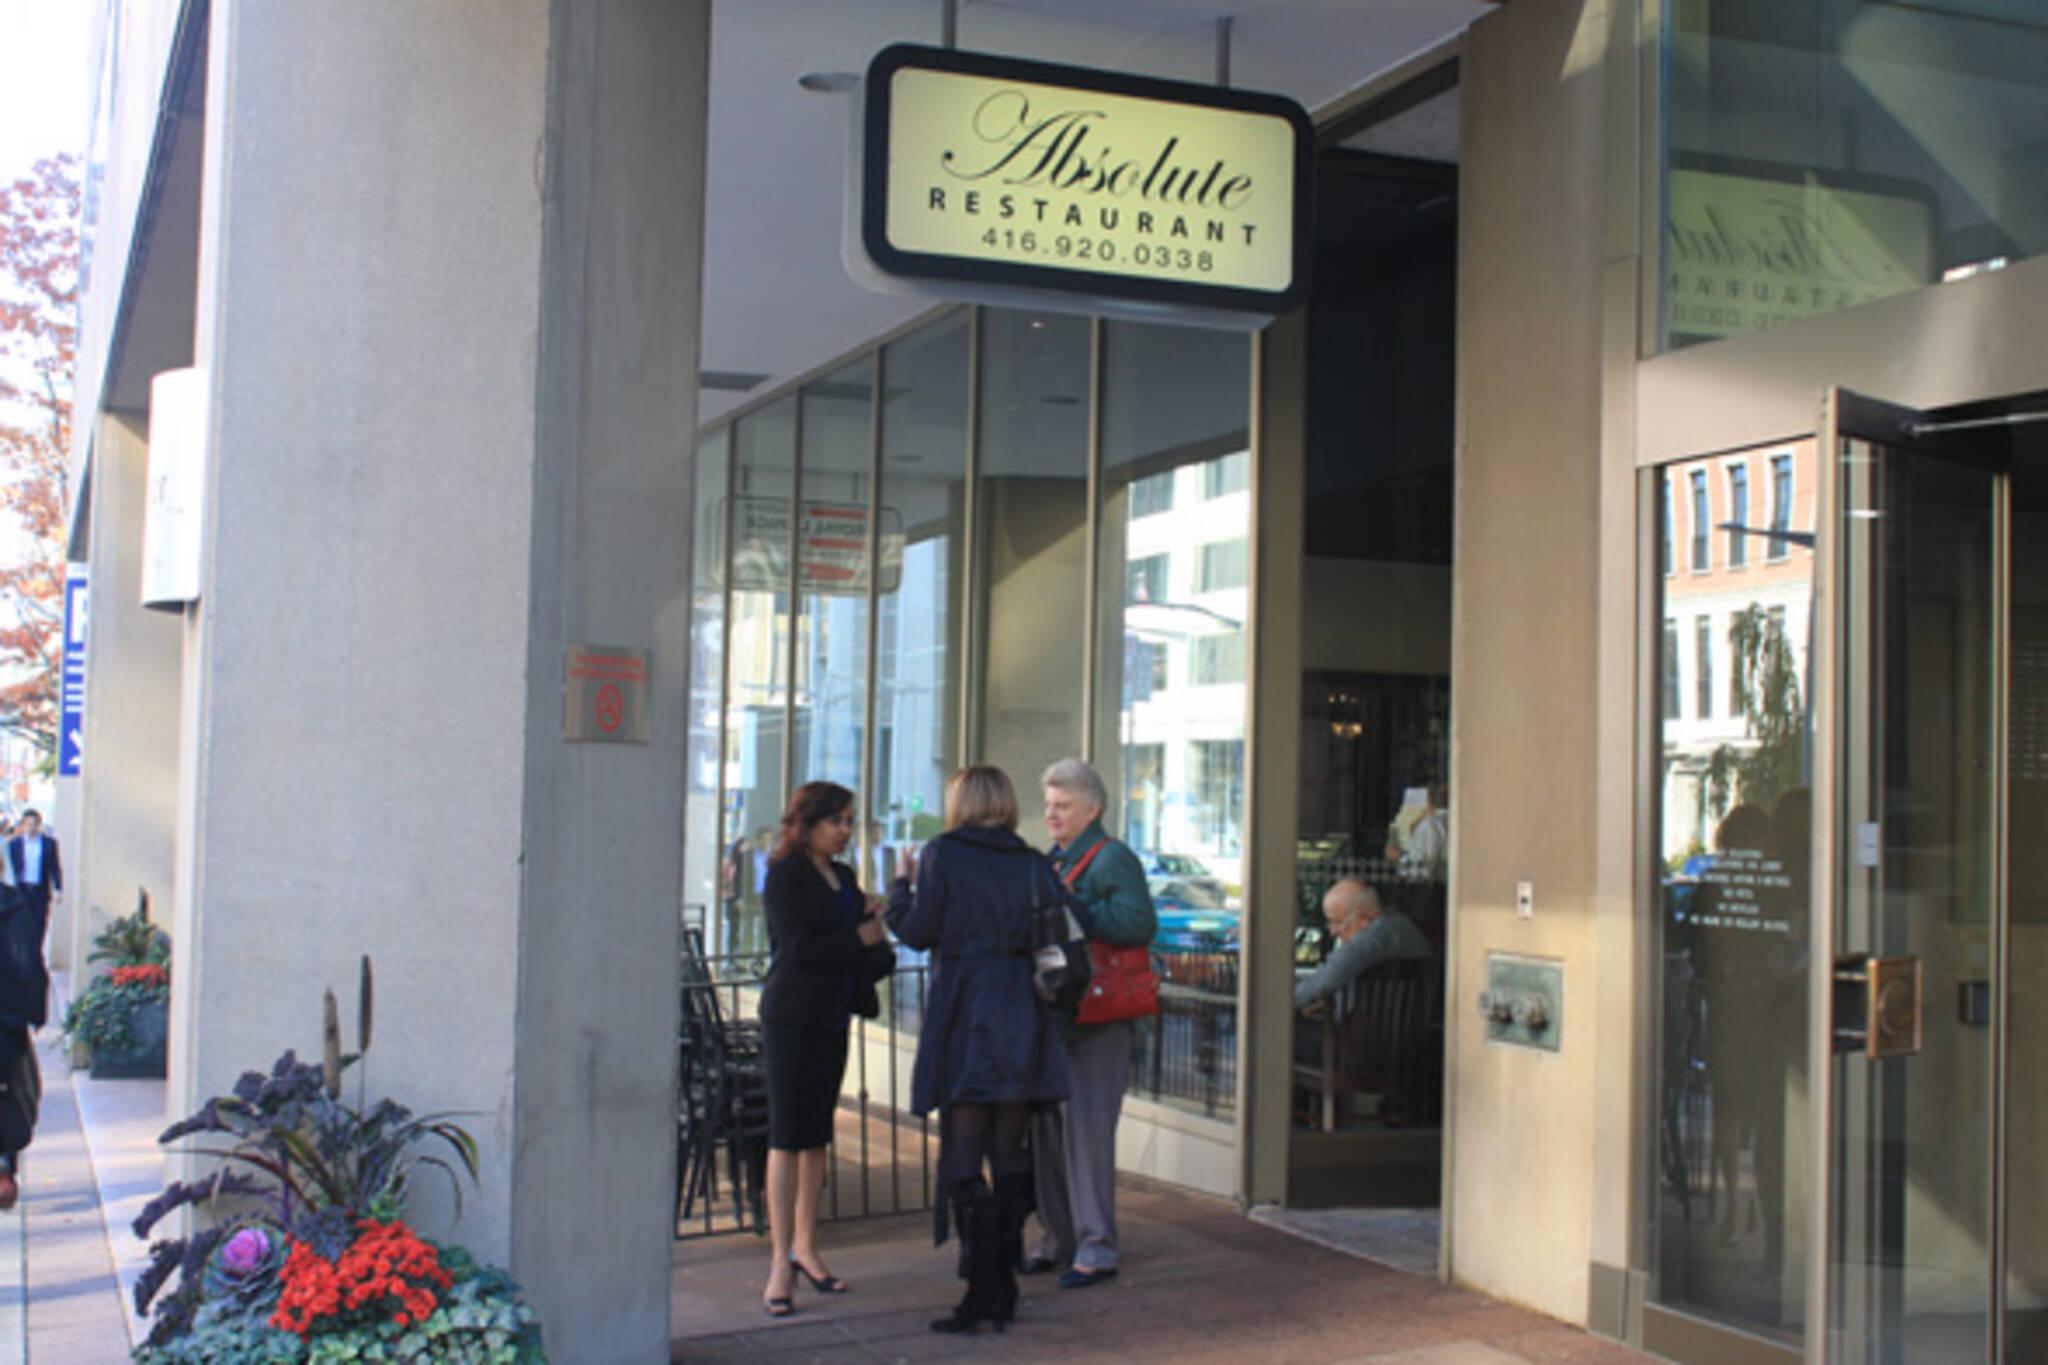 Absolute Restaurant